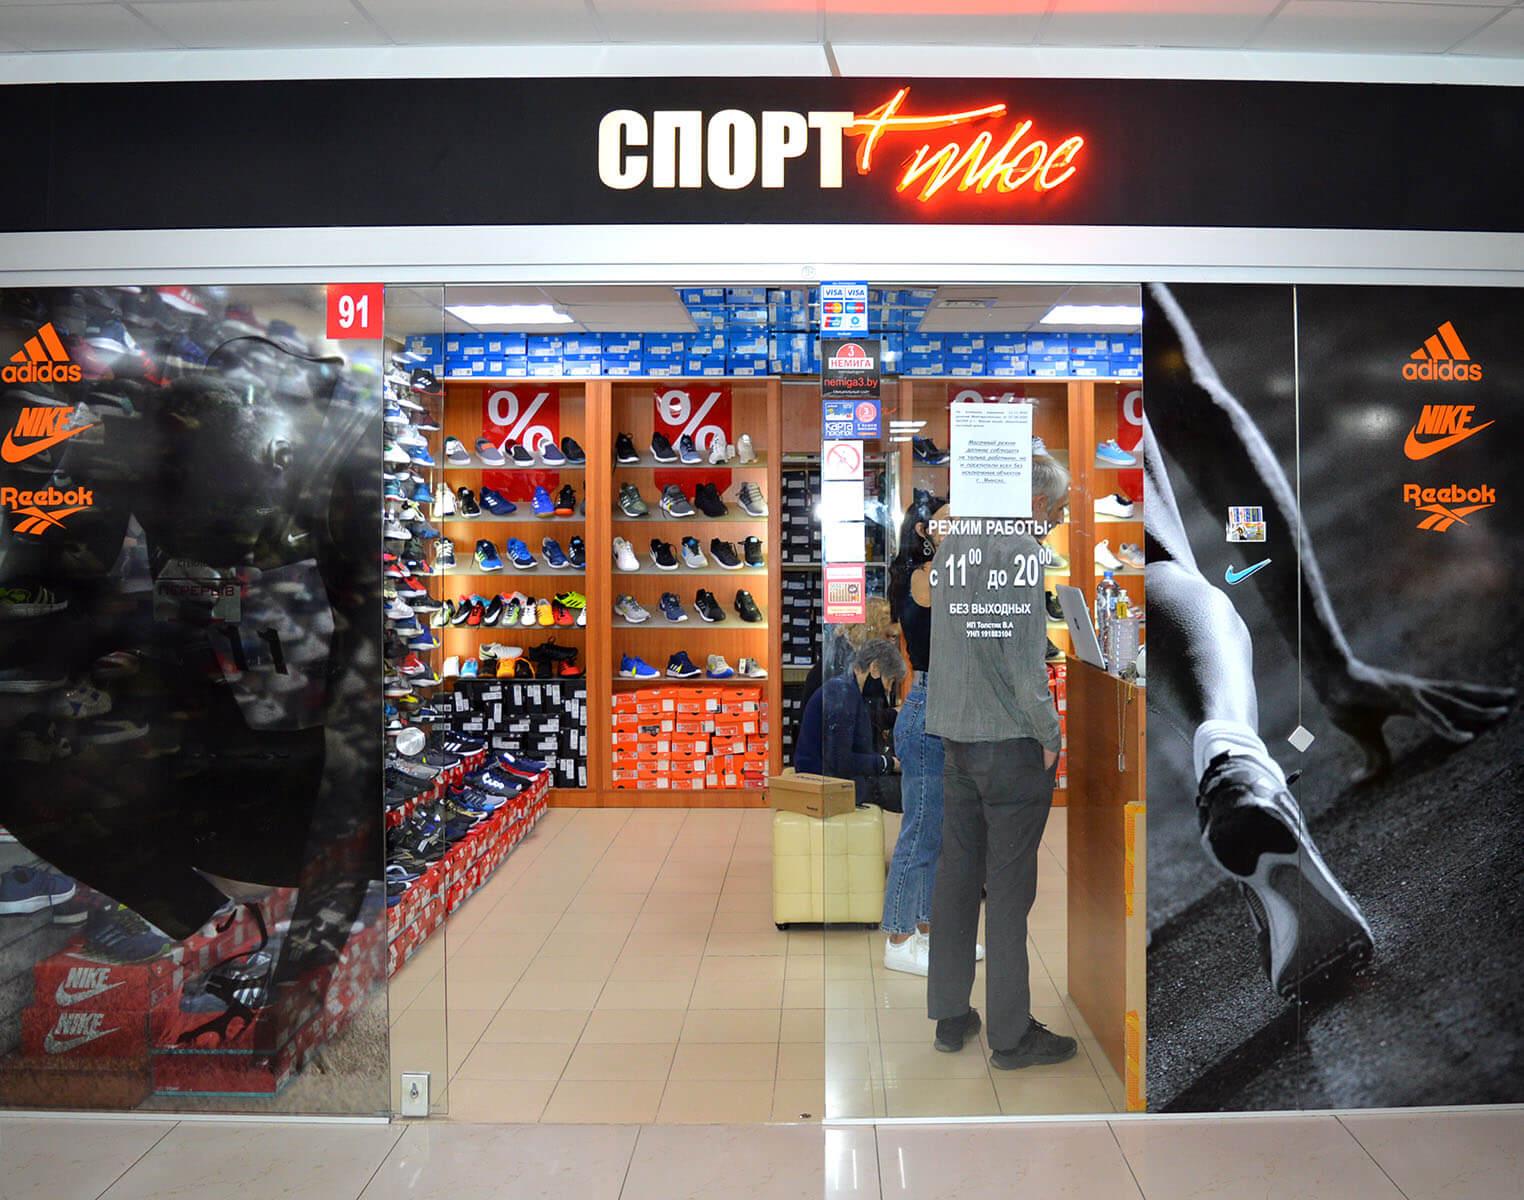 Спорт Плюс (Sport Plus)  - магазин спортивной обуви на 2-м этаже в павильоне №91